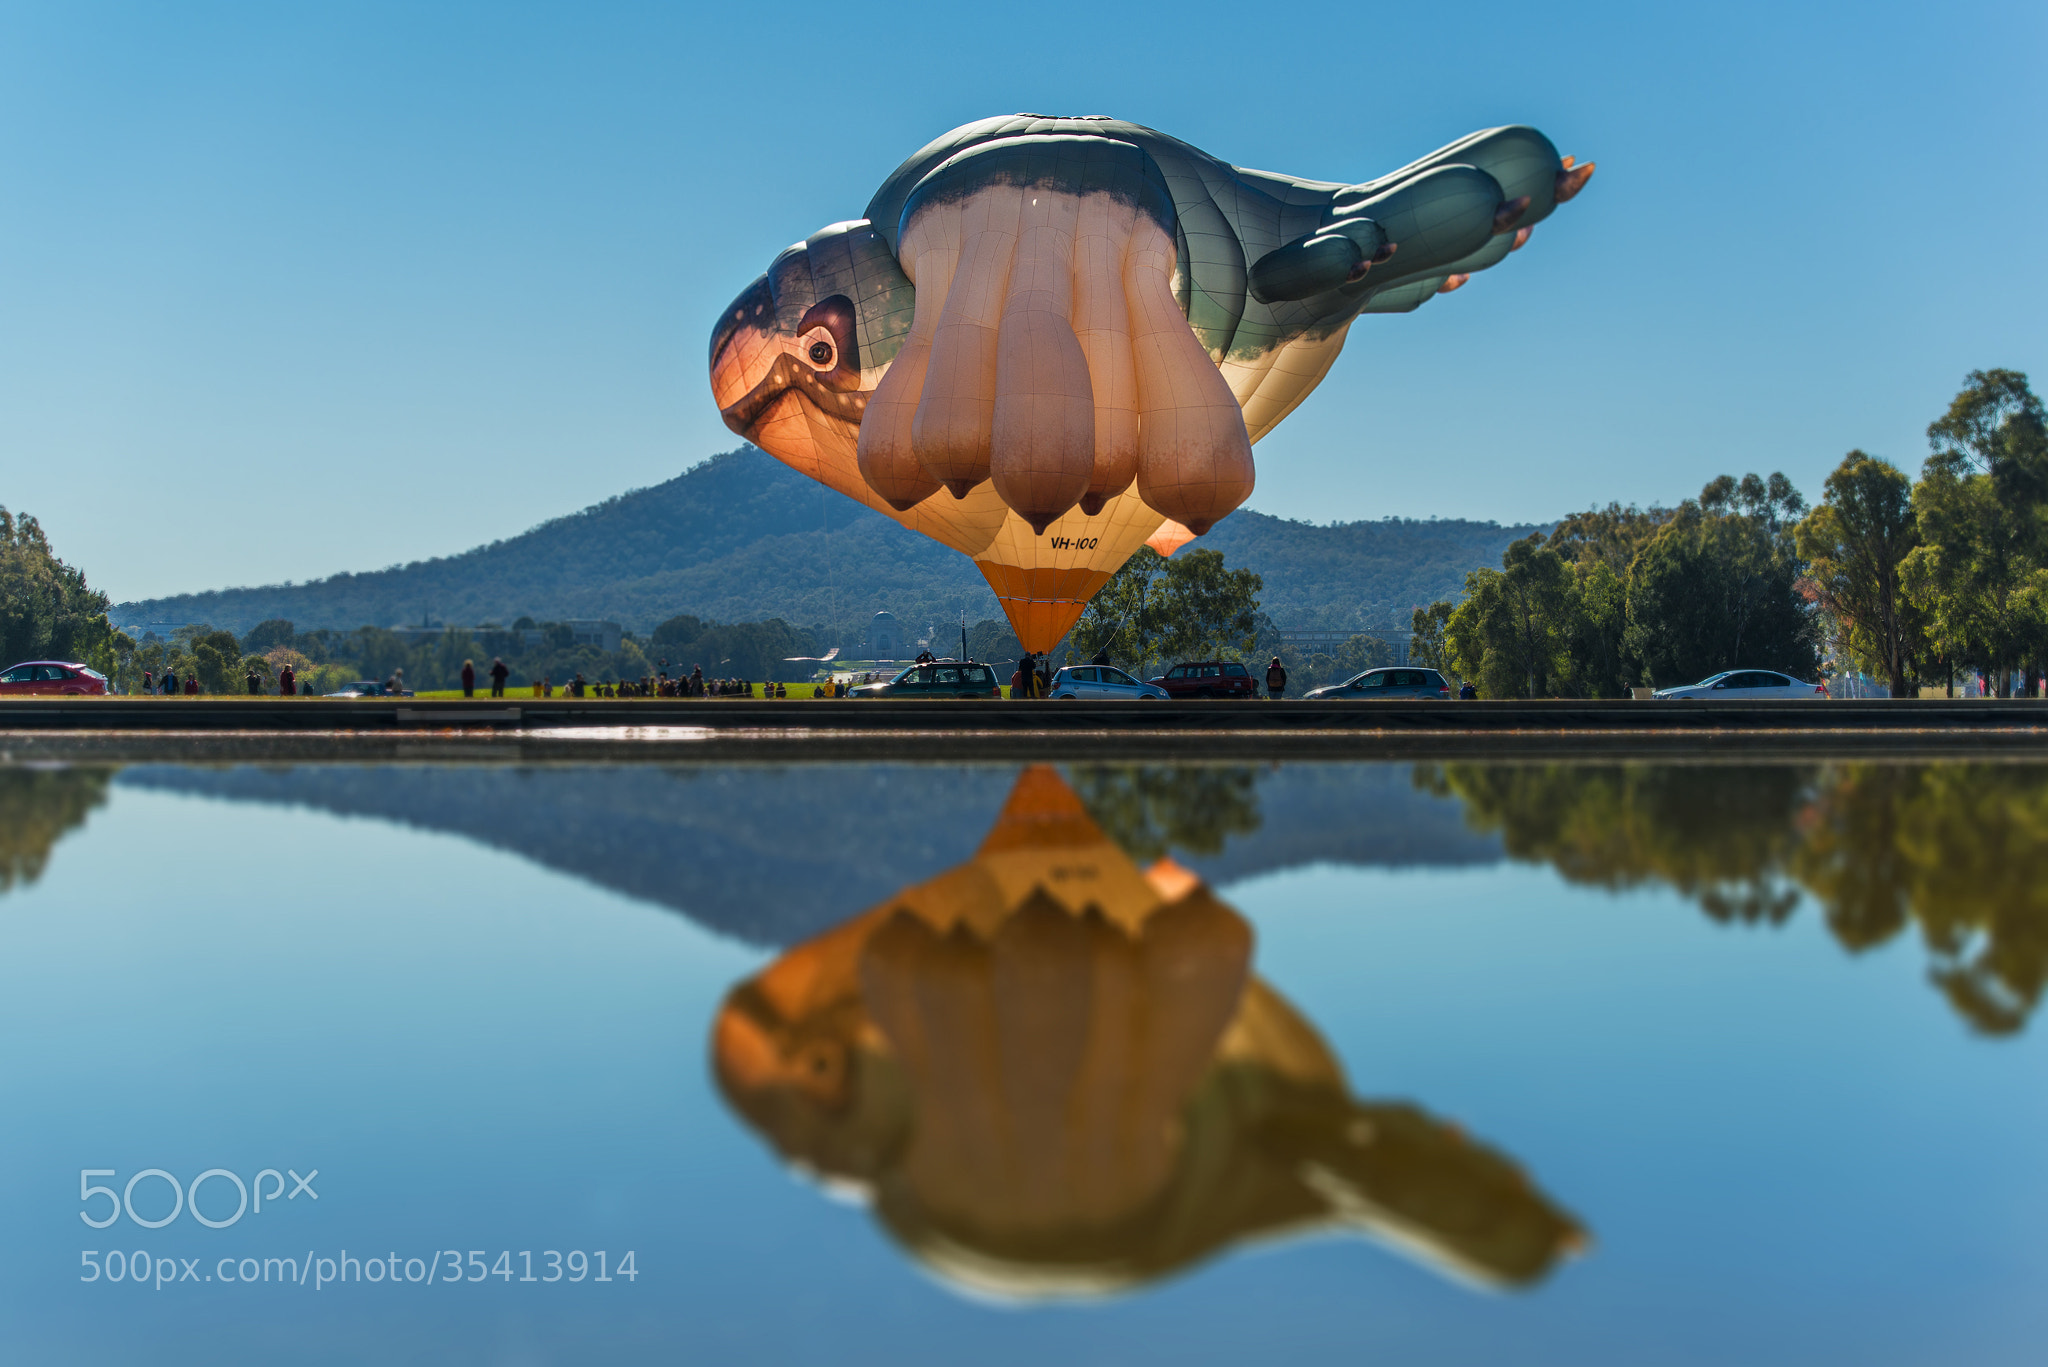 Photograph Skywhale by martin ollman on 500px